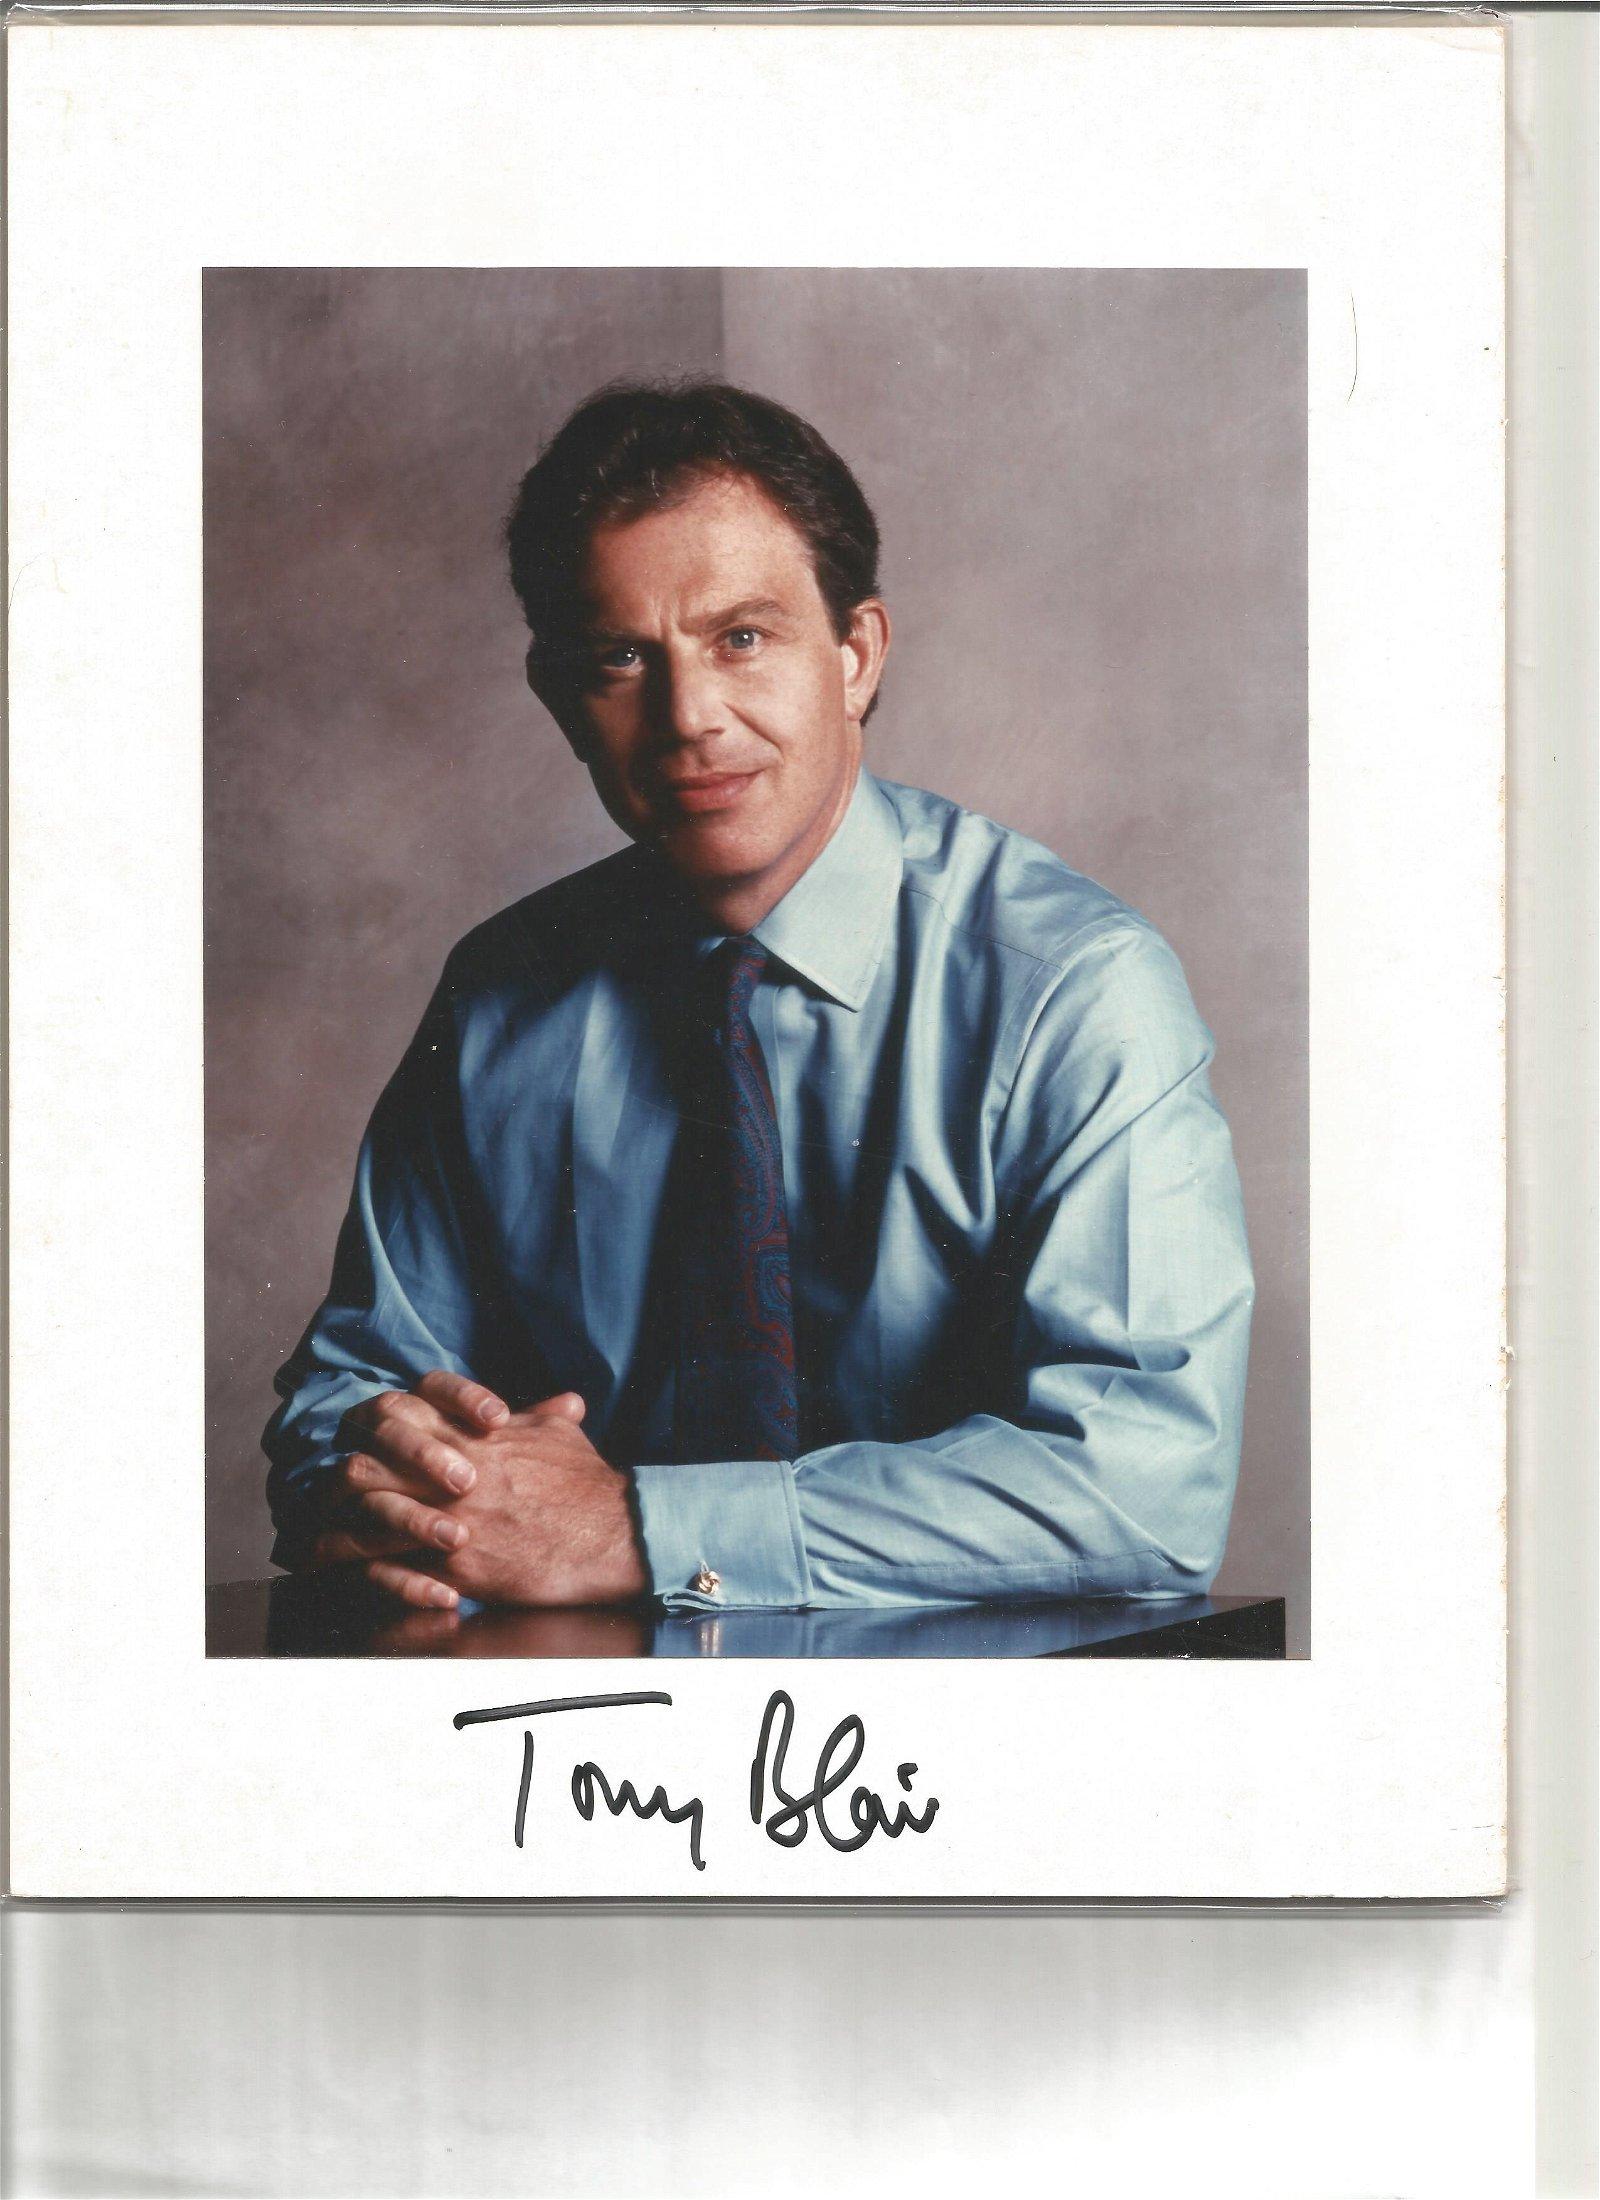 Tony Blair signature piece below colour photo. Good